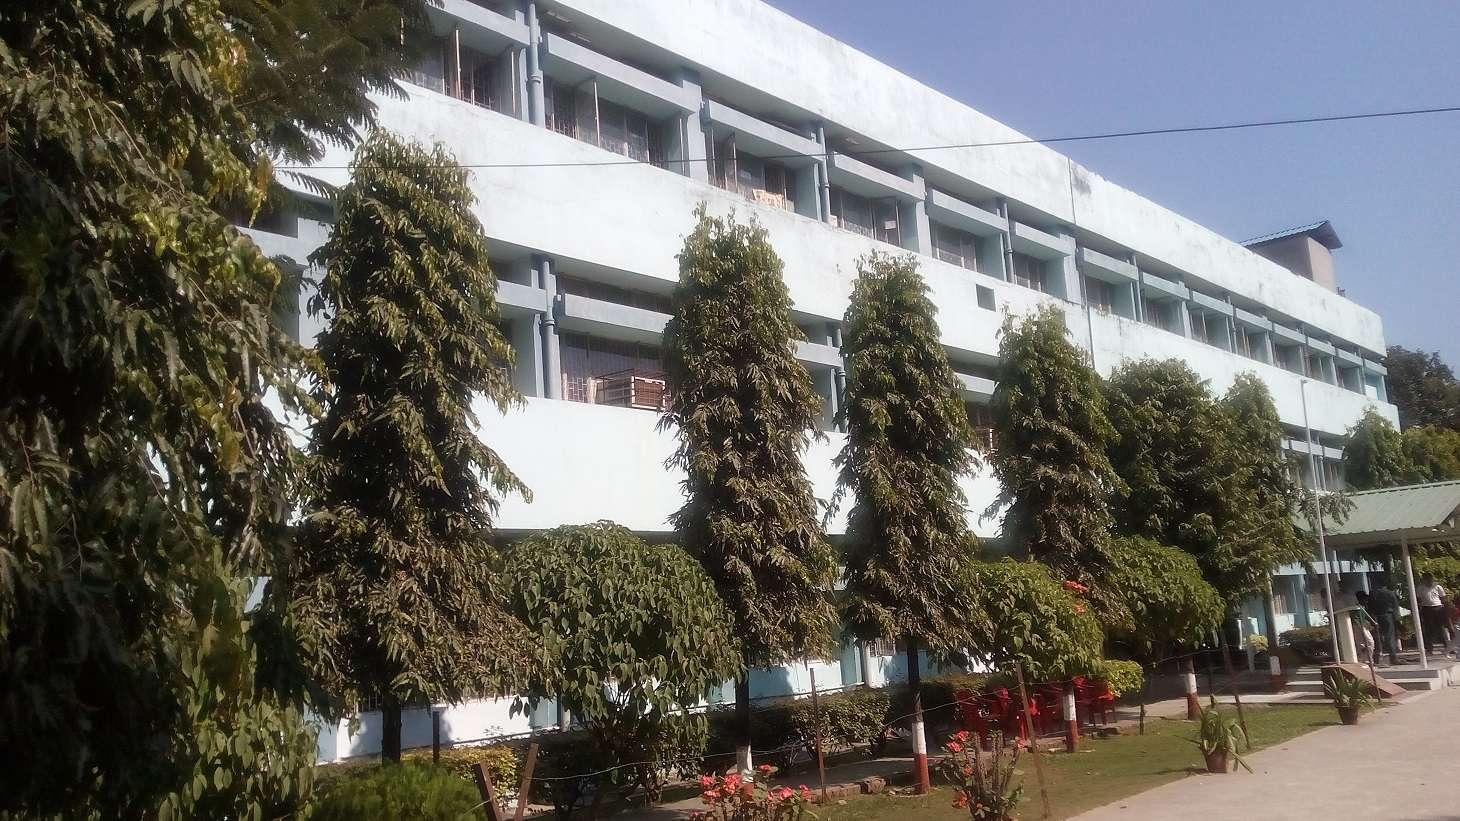 B S F RESIDENTIAL SCHOOL KADAMTALA DARJEELING WEST BENGAL 2430025